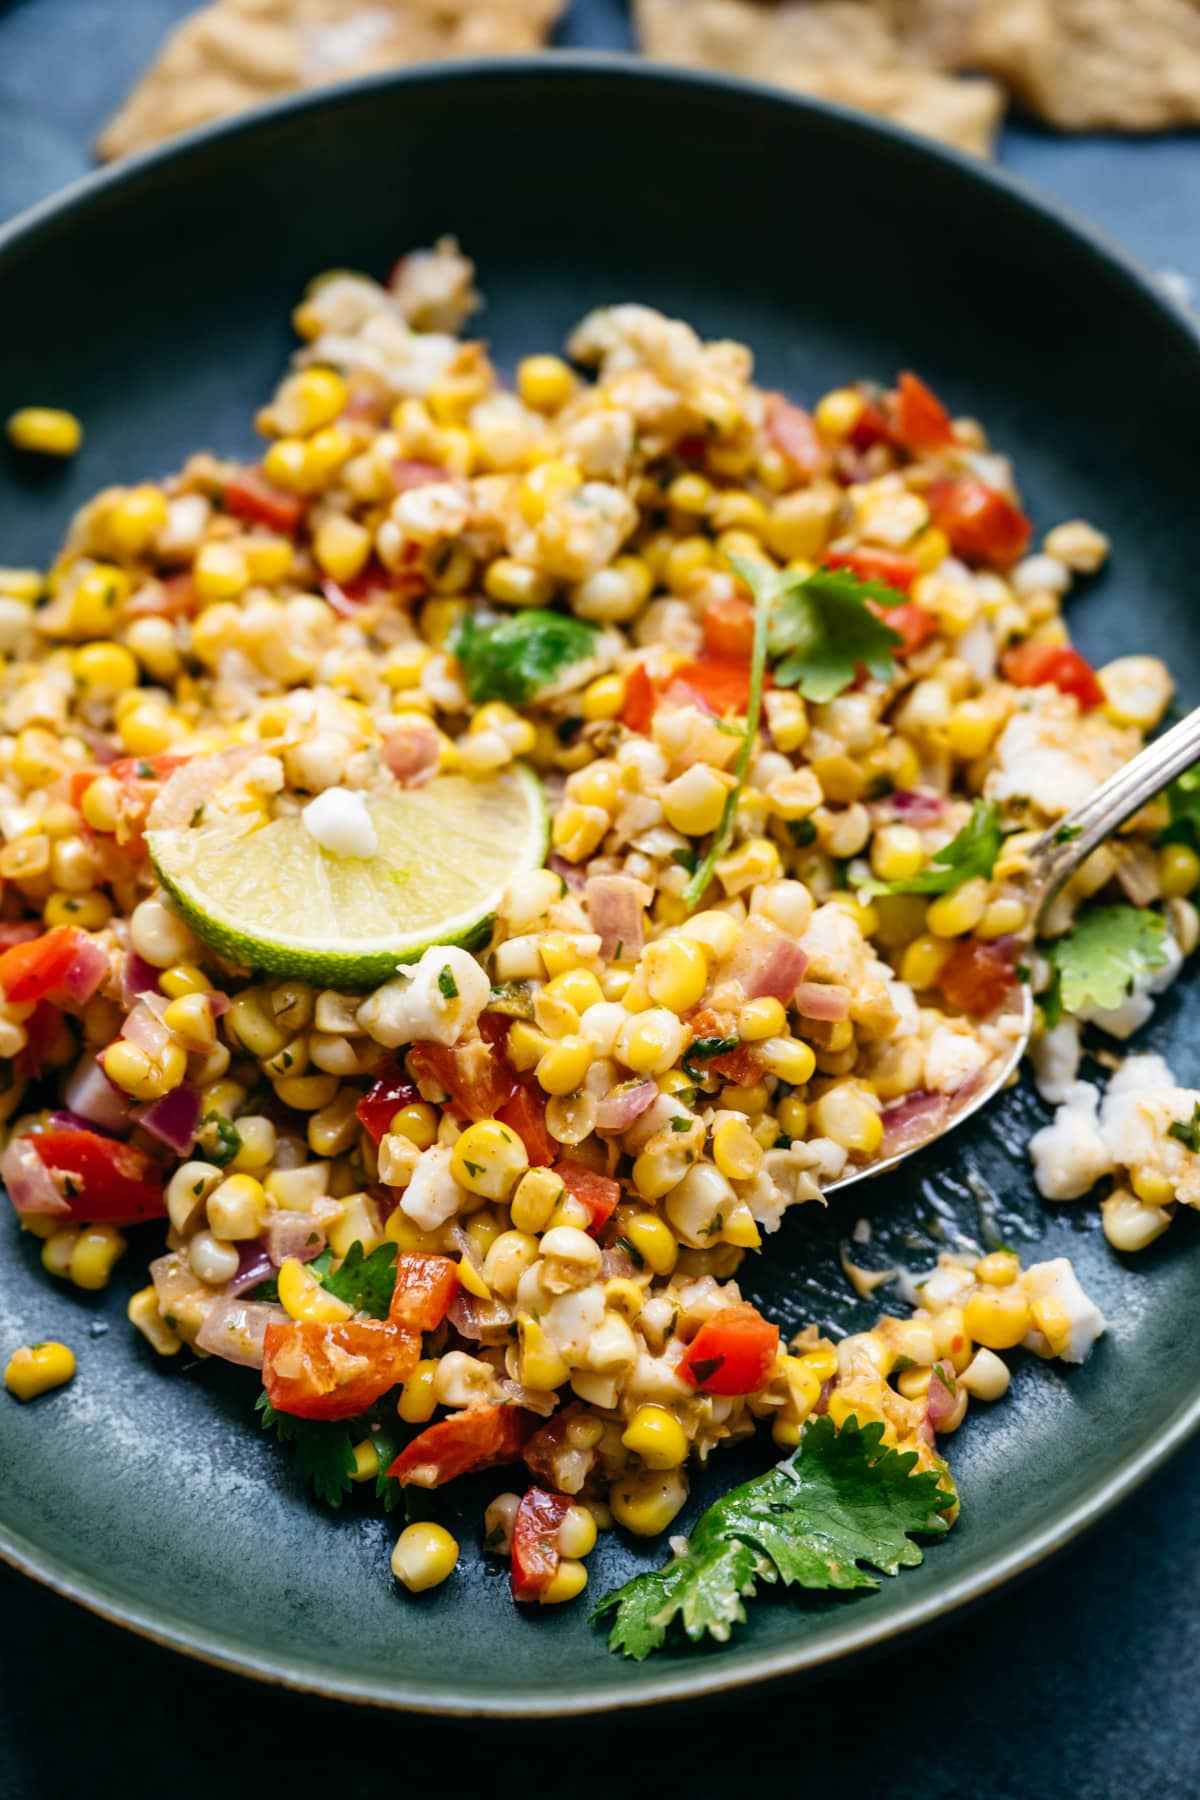 close up view of vegan corn salad in a bowl